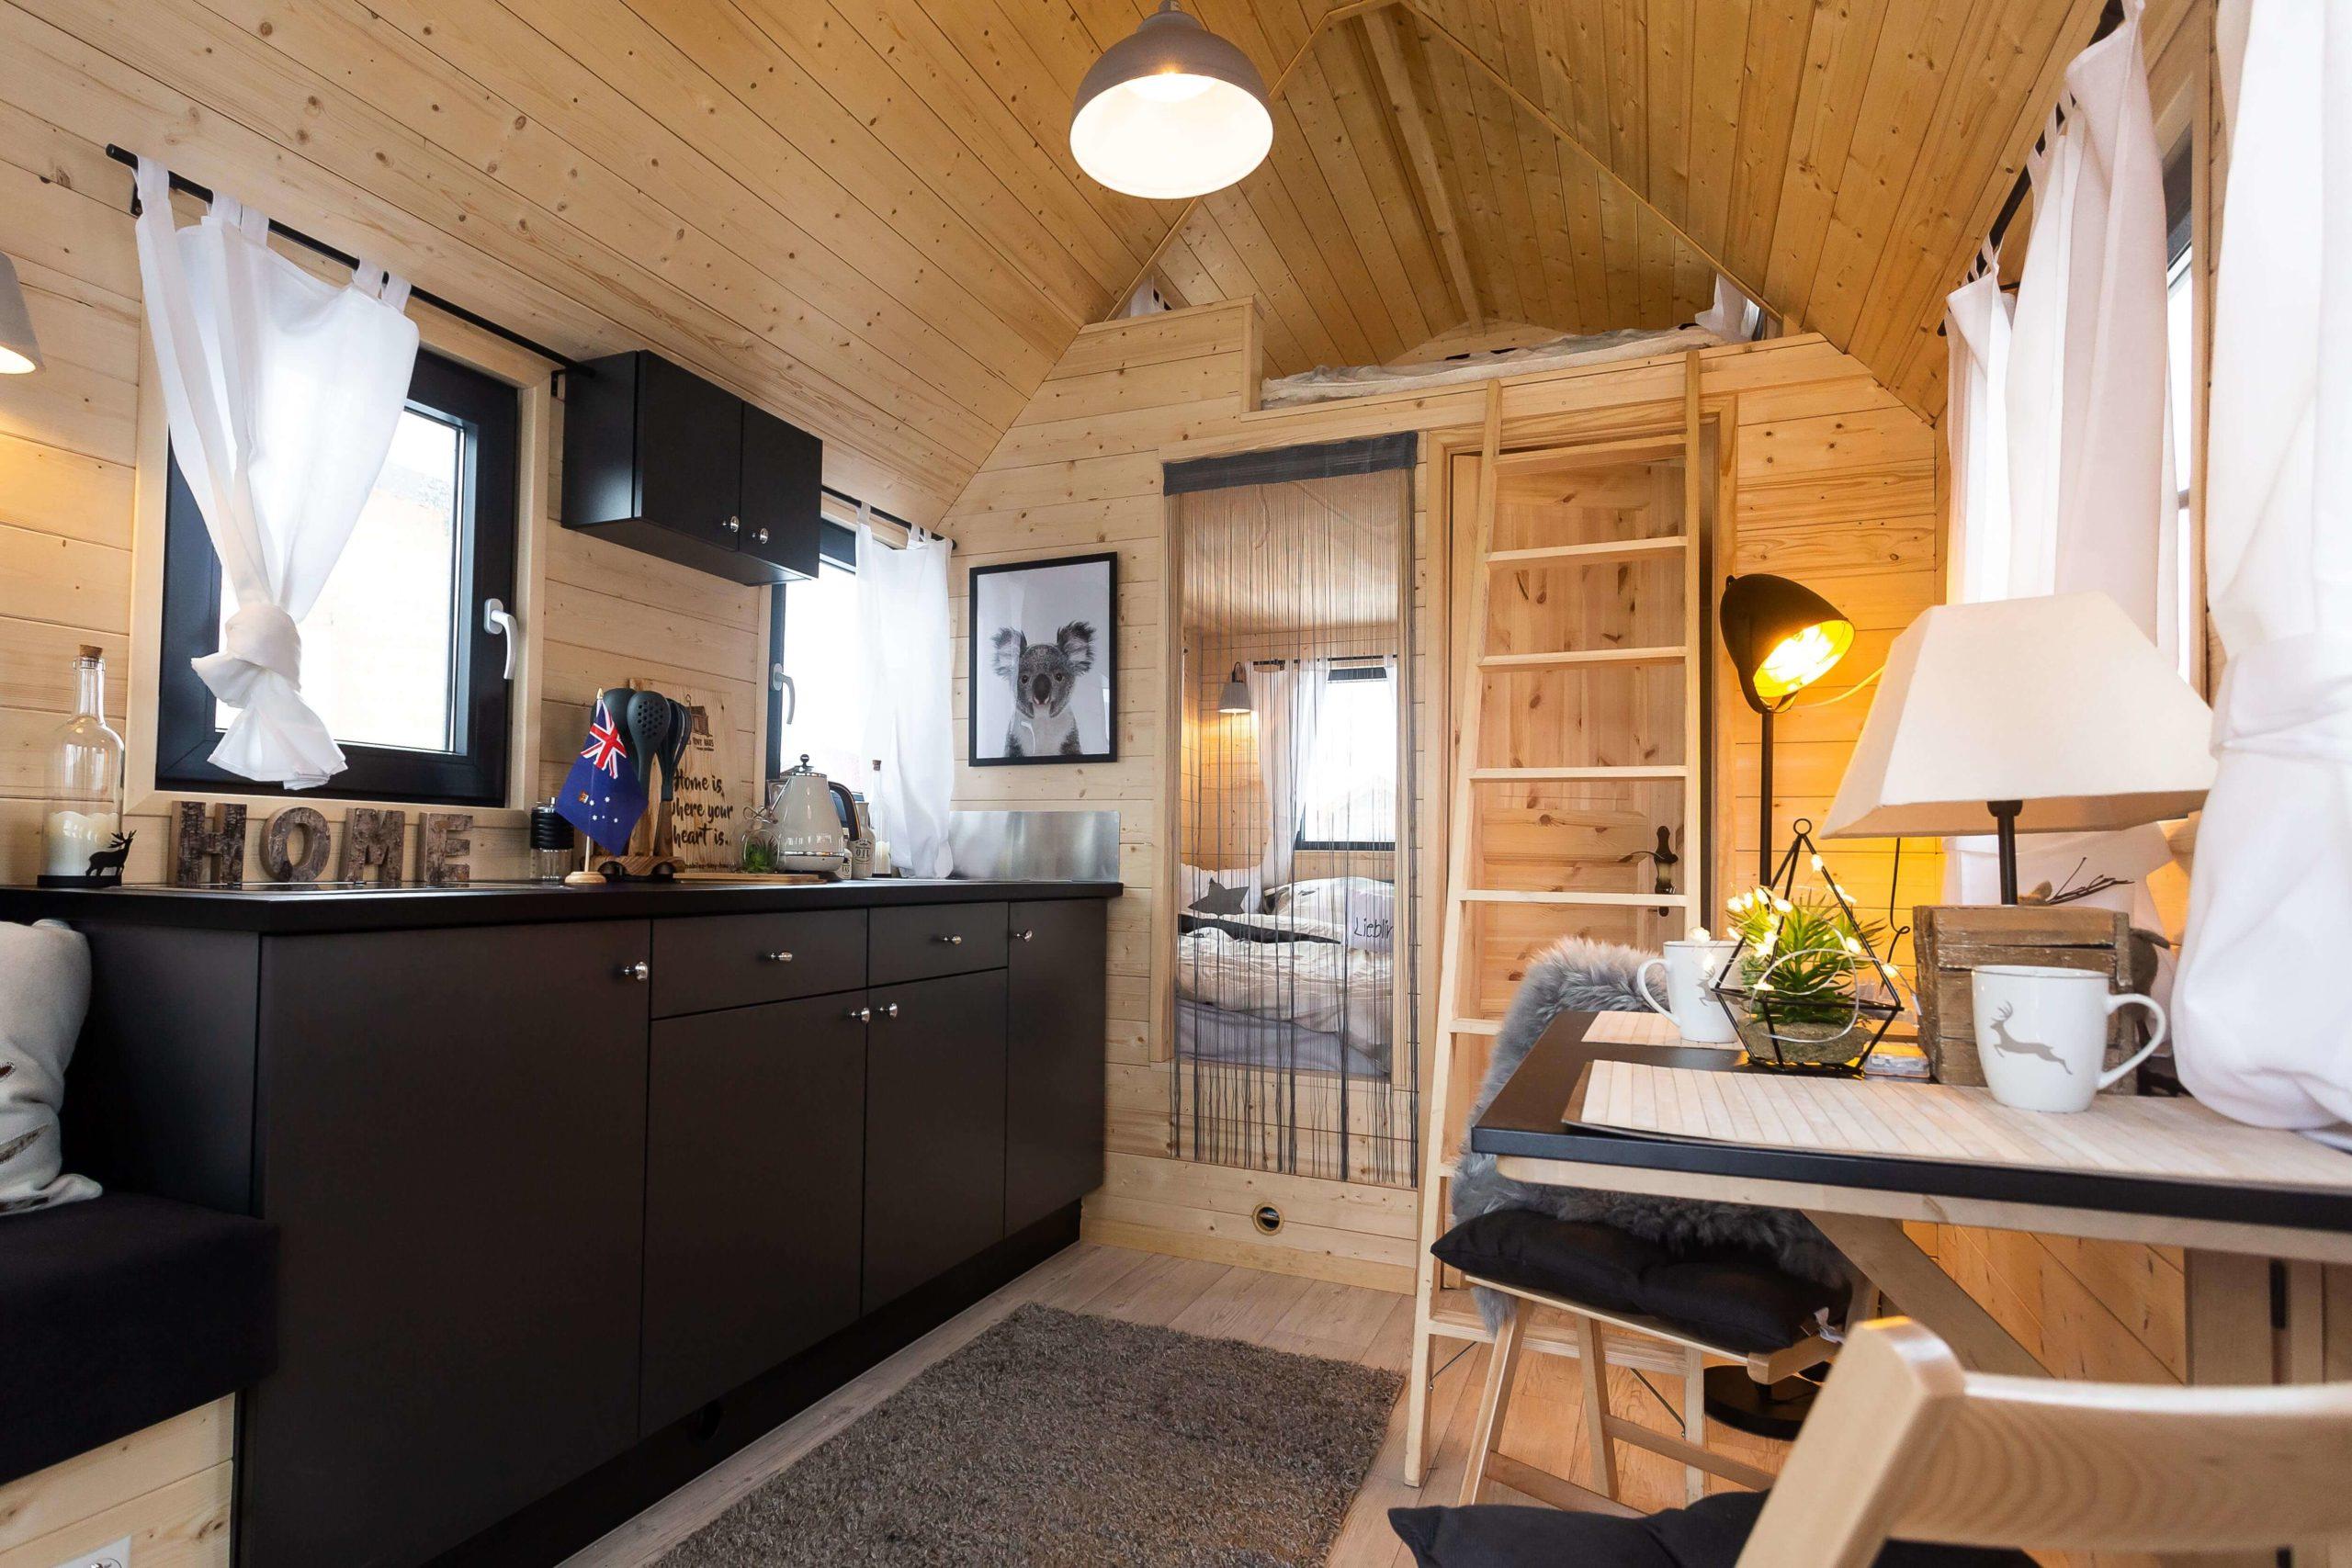 mobiles-tiny-house-australien-vital-camp-gmbh-01